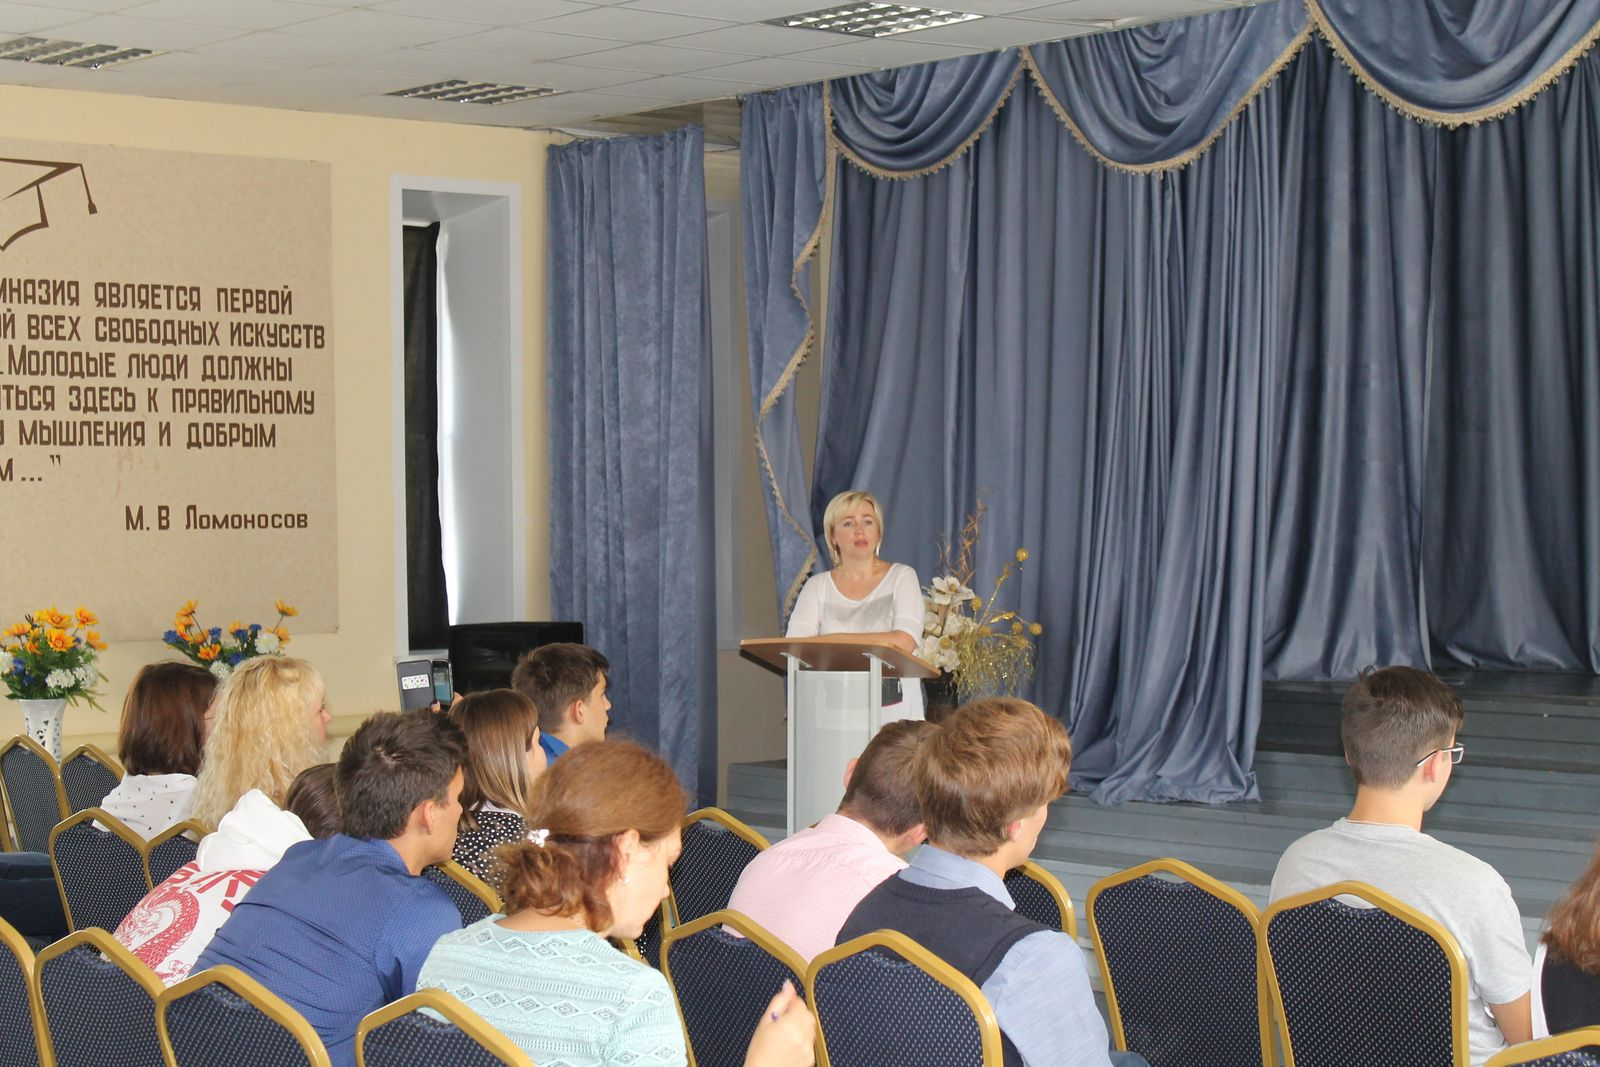 Сотрудники КБМ проводят встречи со школьниками